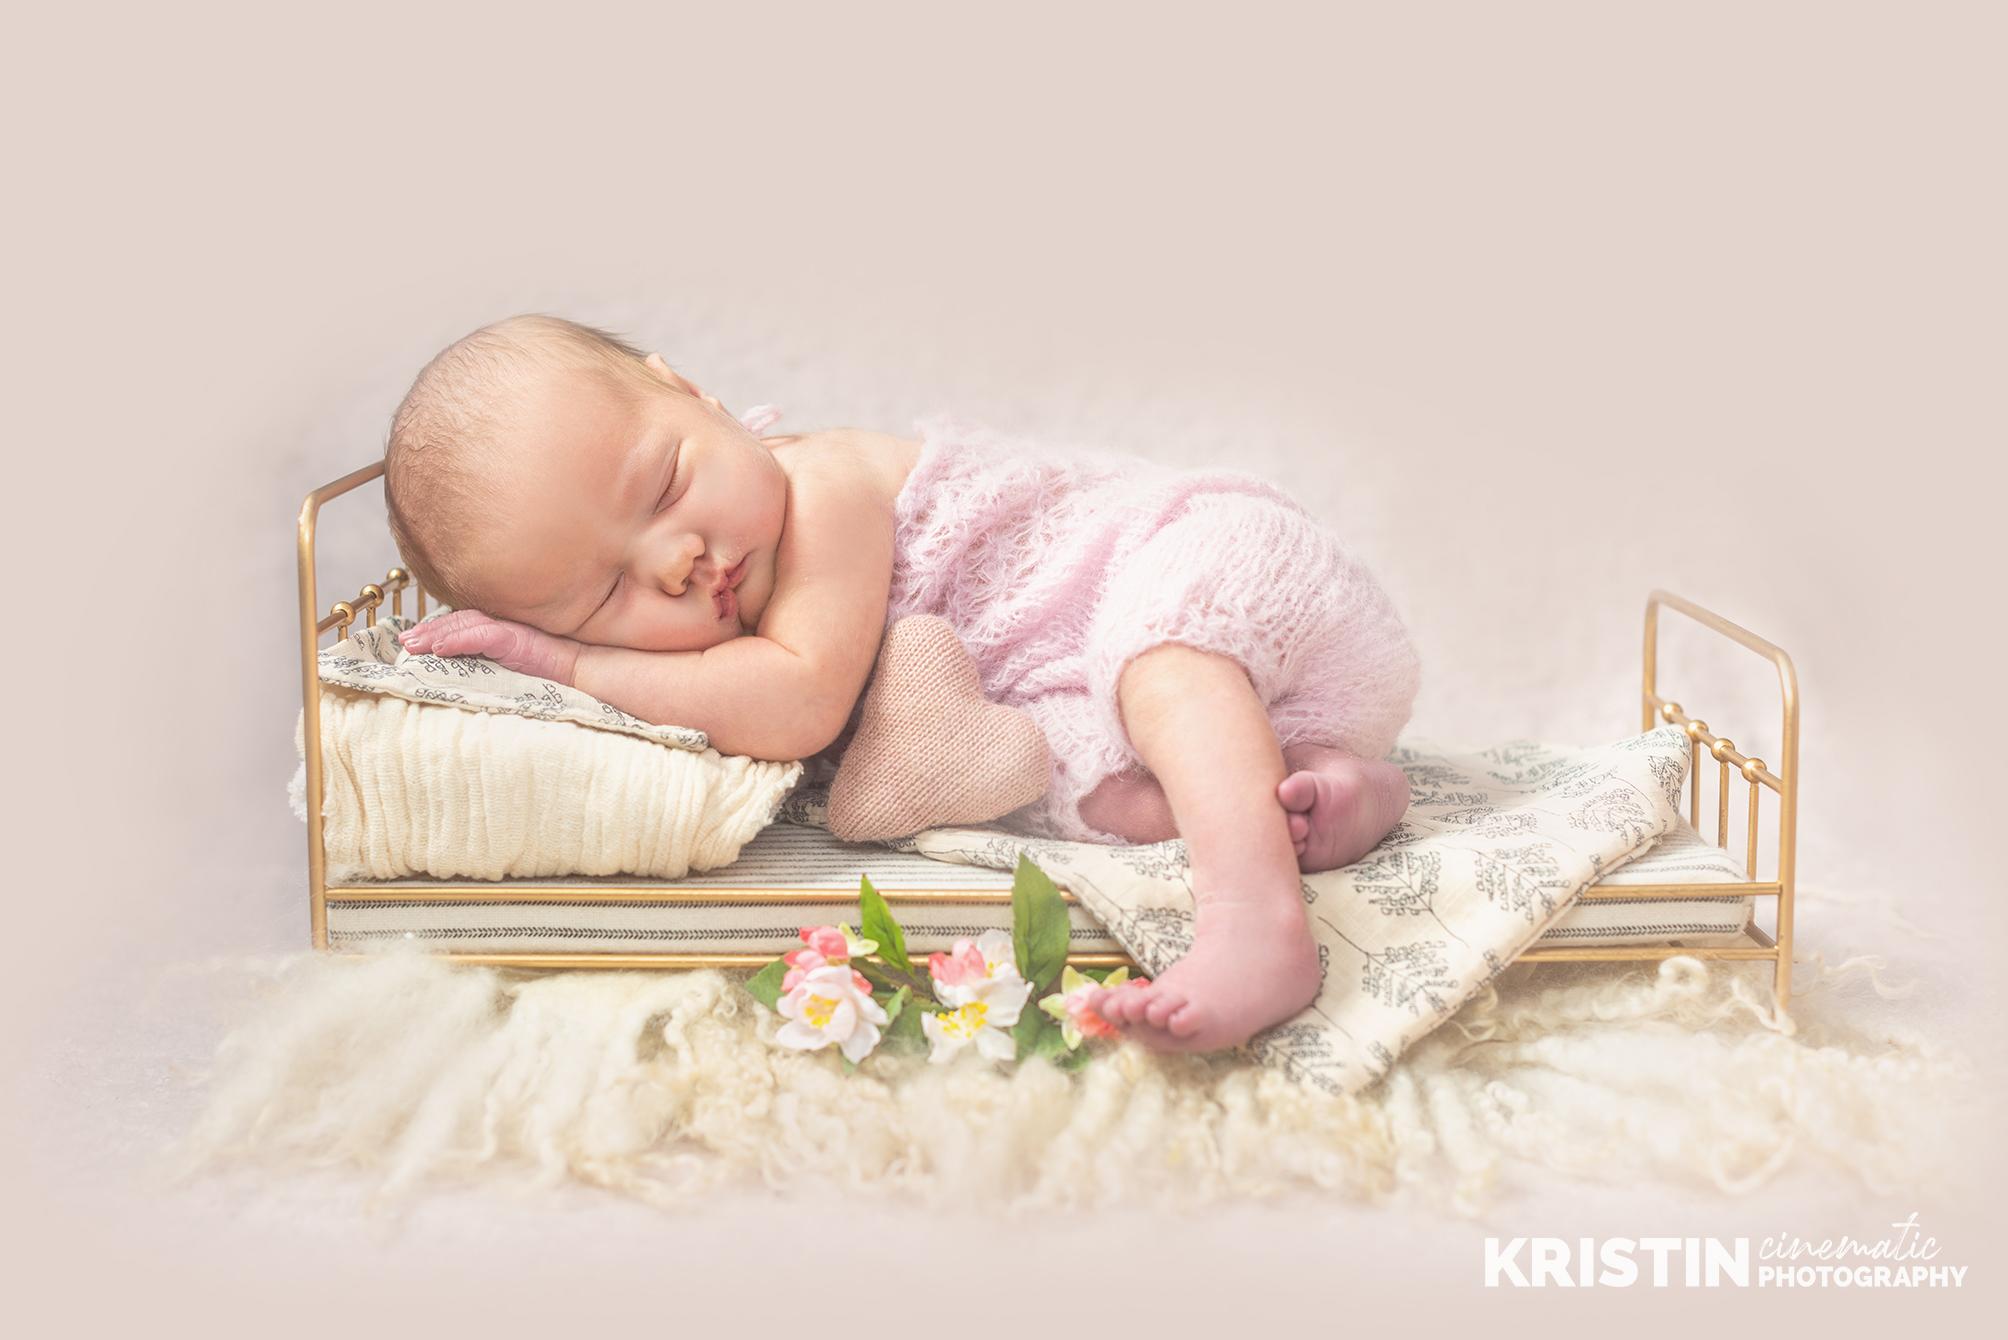 Kristin - Photography 2cop.jpg